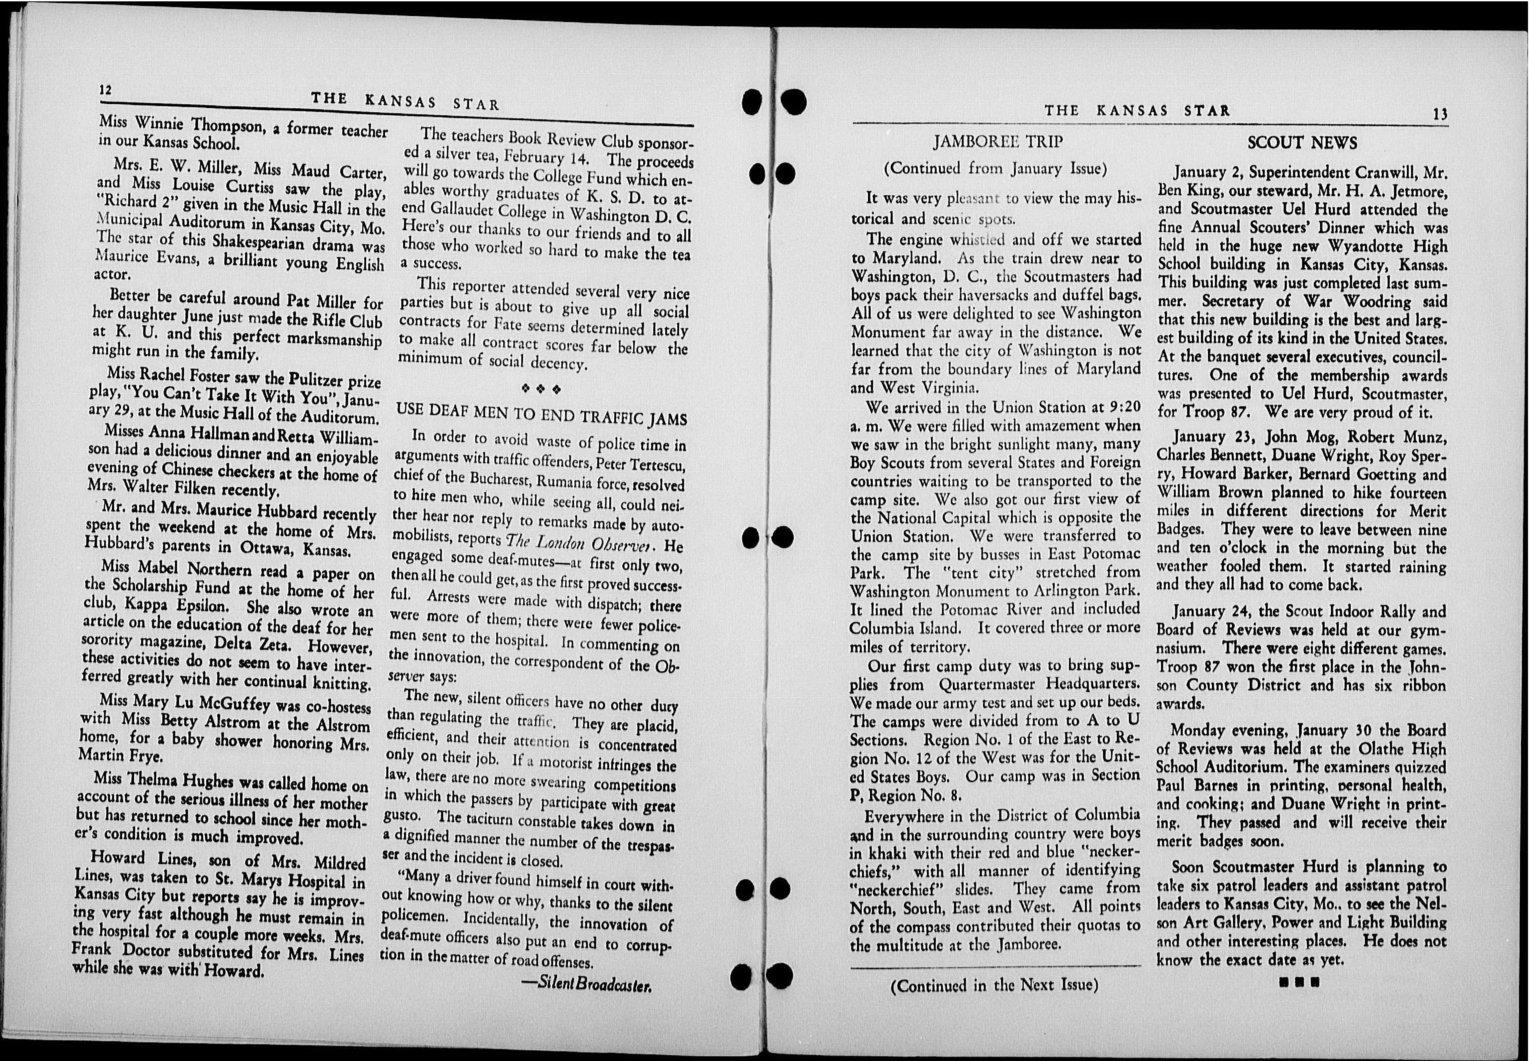 The Kansas Star, volume 52, number 6 - 12-13